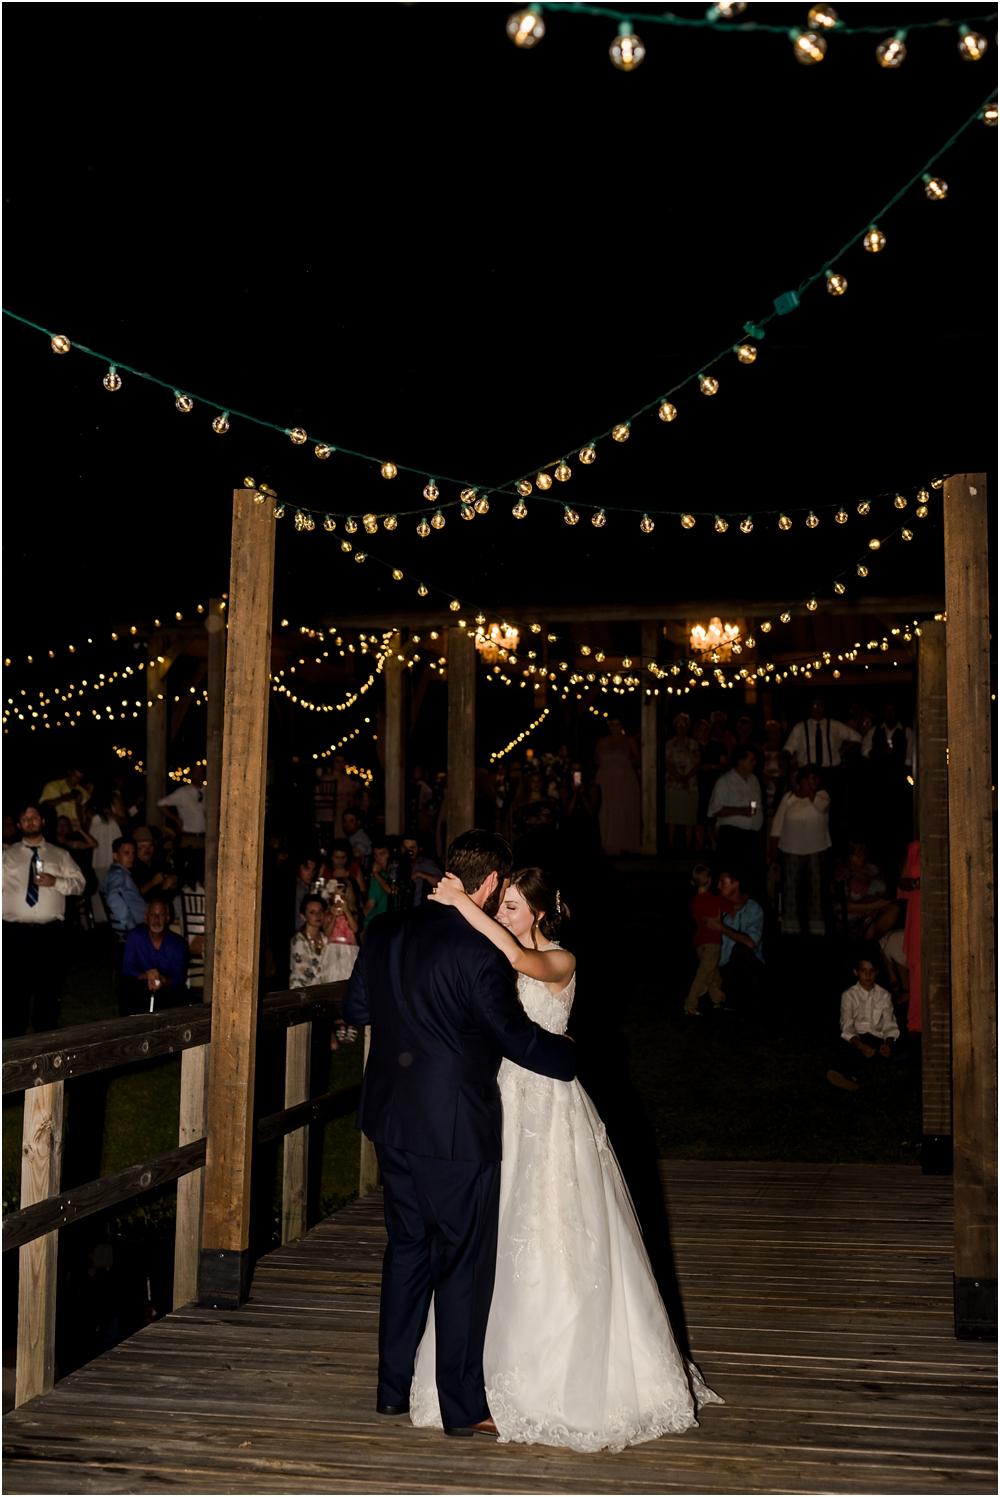 marianna-florida-wedding-photographer-kiersten-grant-181.jpg